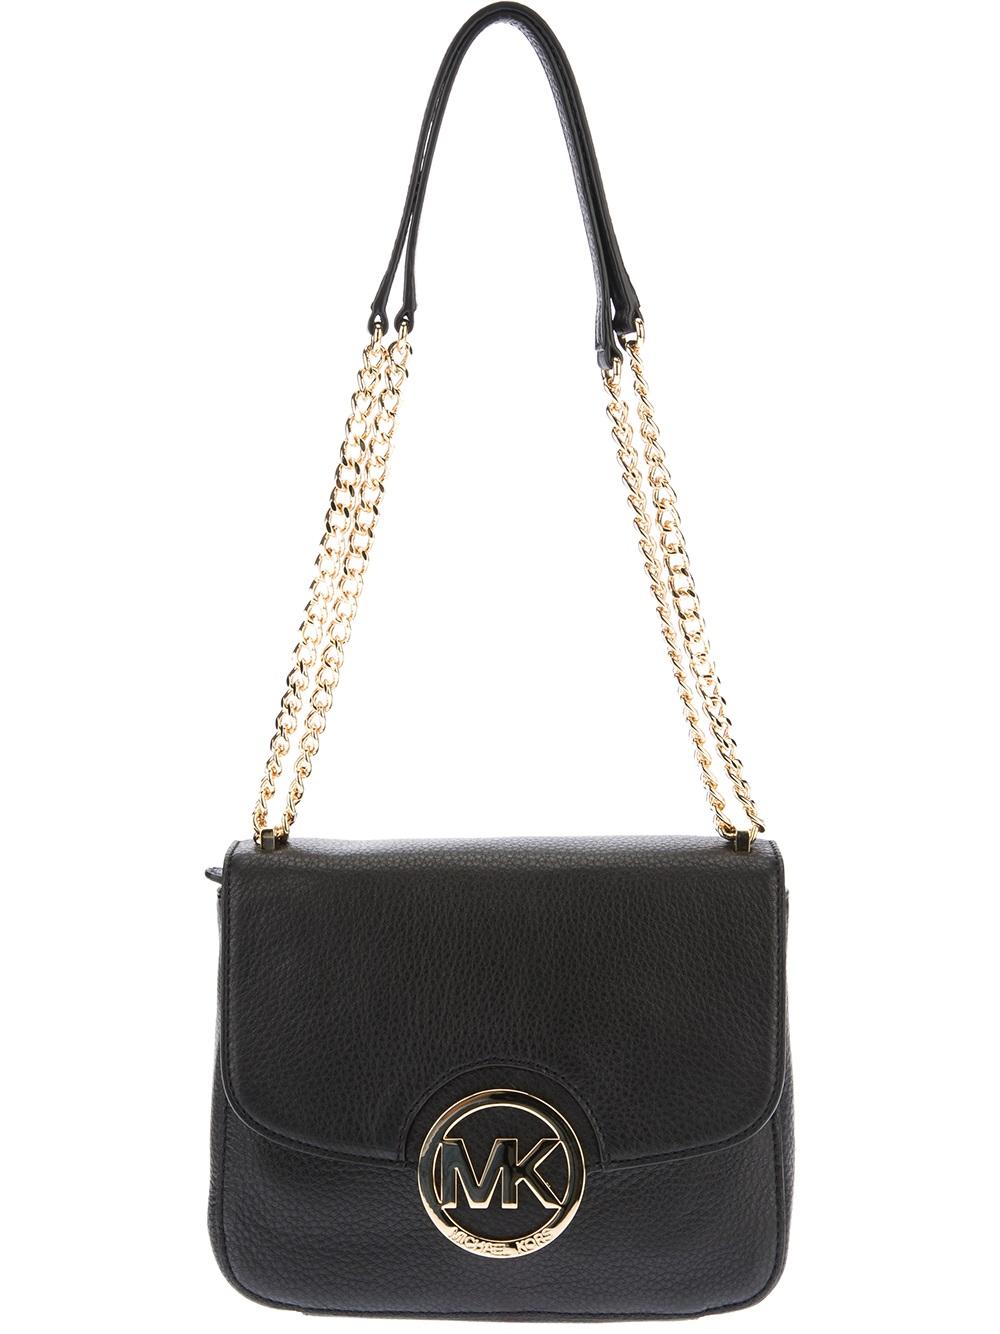 Lyst Michael Kors Chain Detail Shoulder Bag In Black